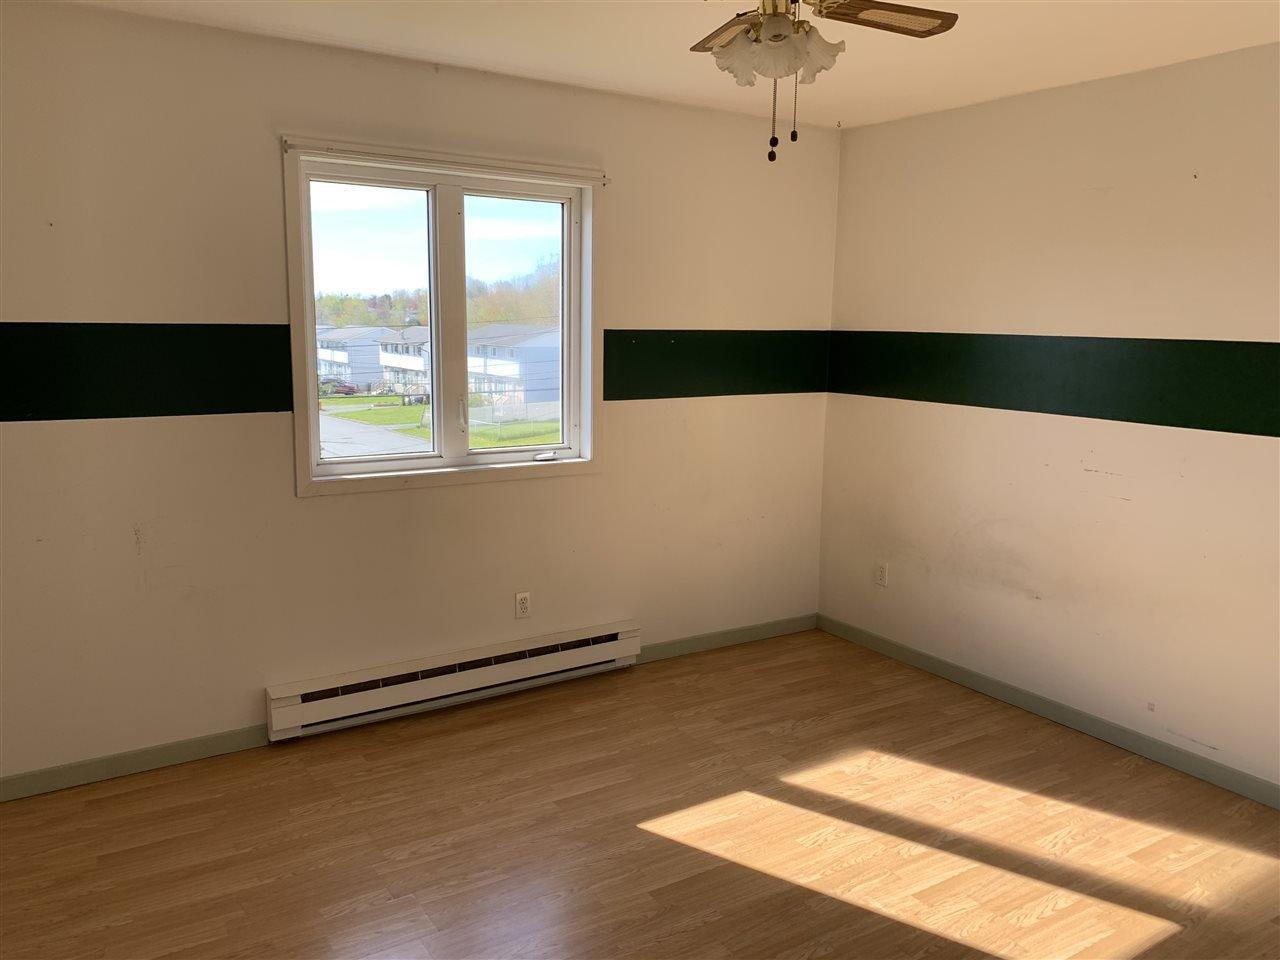 Photo 5: Photos: 8 Emily Court in Lower Sackville: 25-Sackville Residential for sale (Halifax-Dartmouth)  : MLS®# 202008626